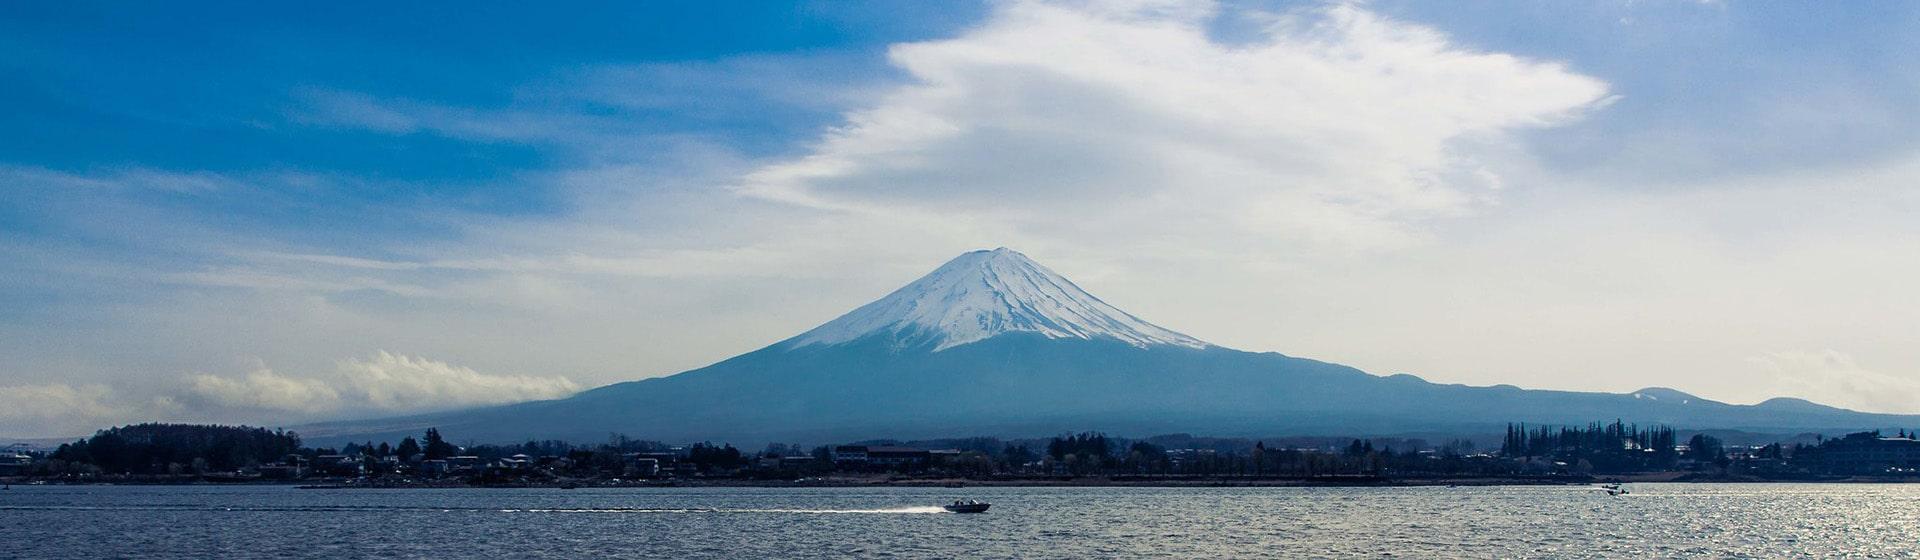 Рассуждения о Японии <br>Токио – Одайба – Фудзи-Кавагутико – Киото – Арасияма – Токио